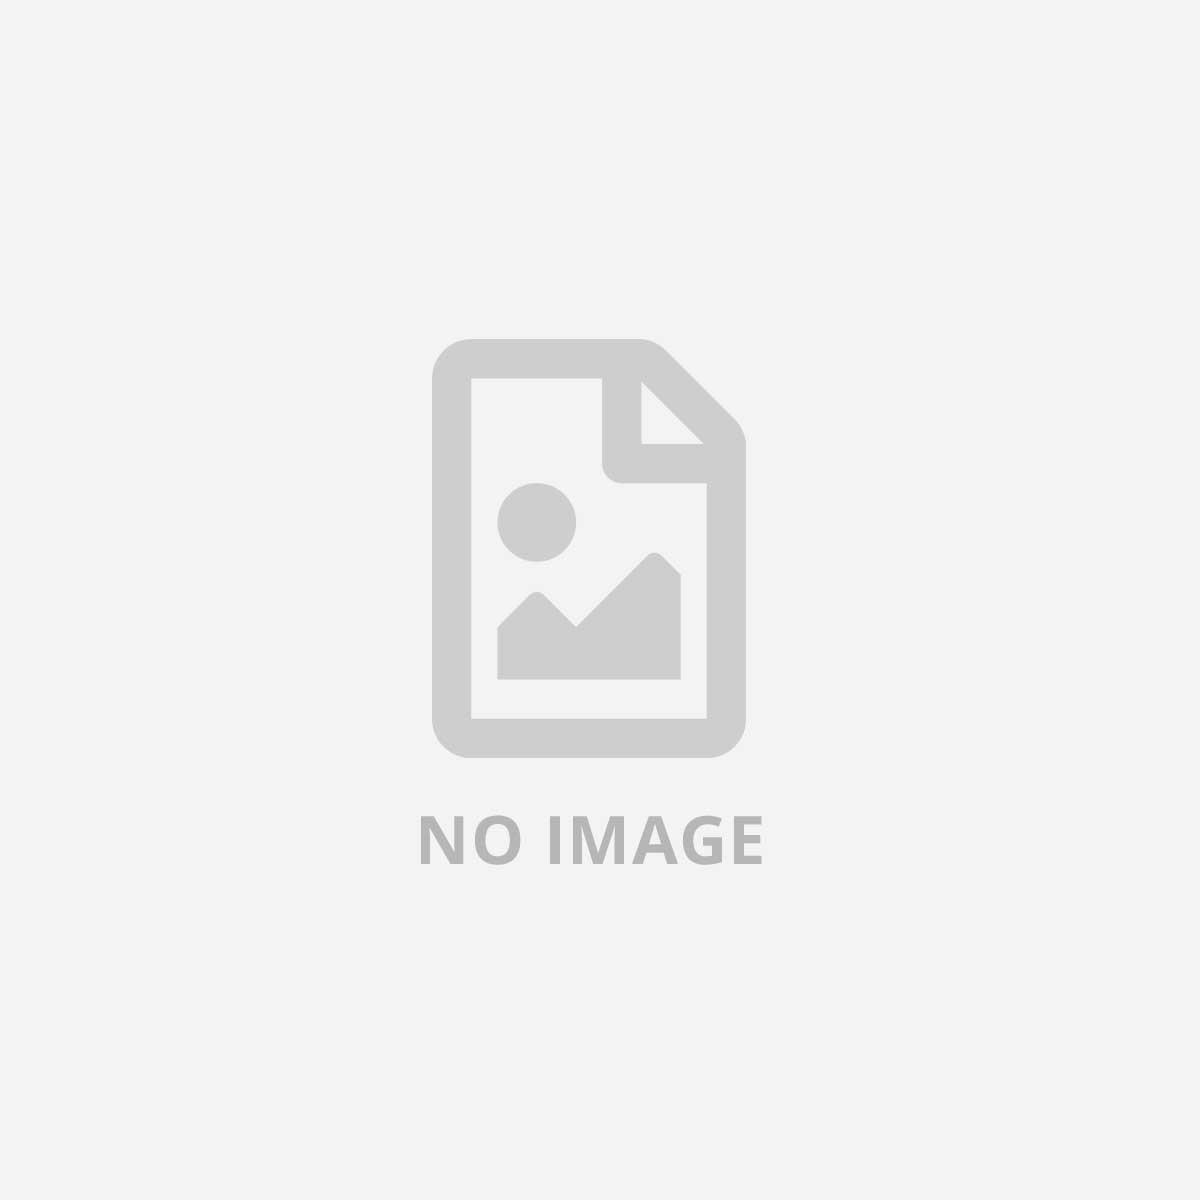 ASUS XONAR ESSENCE STX II 7.1